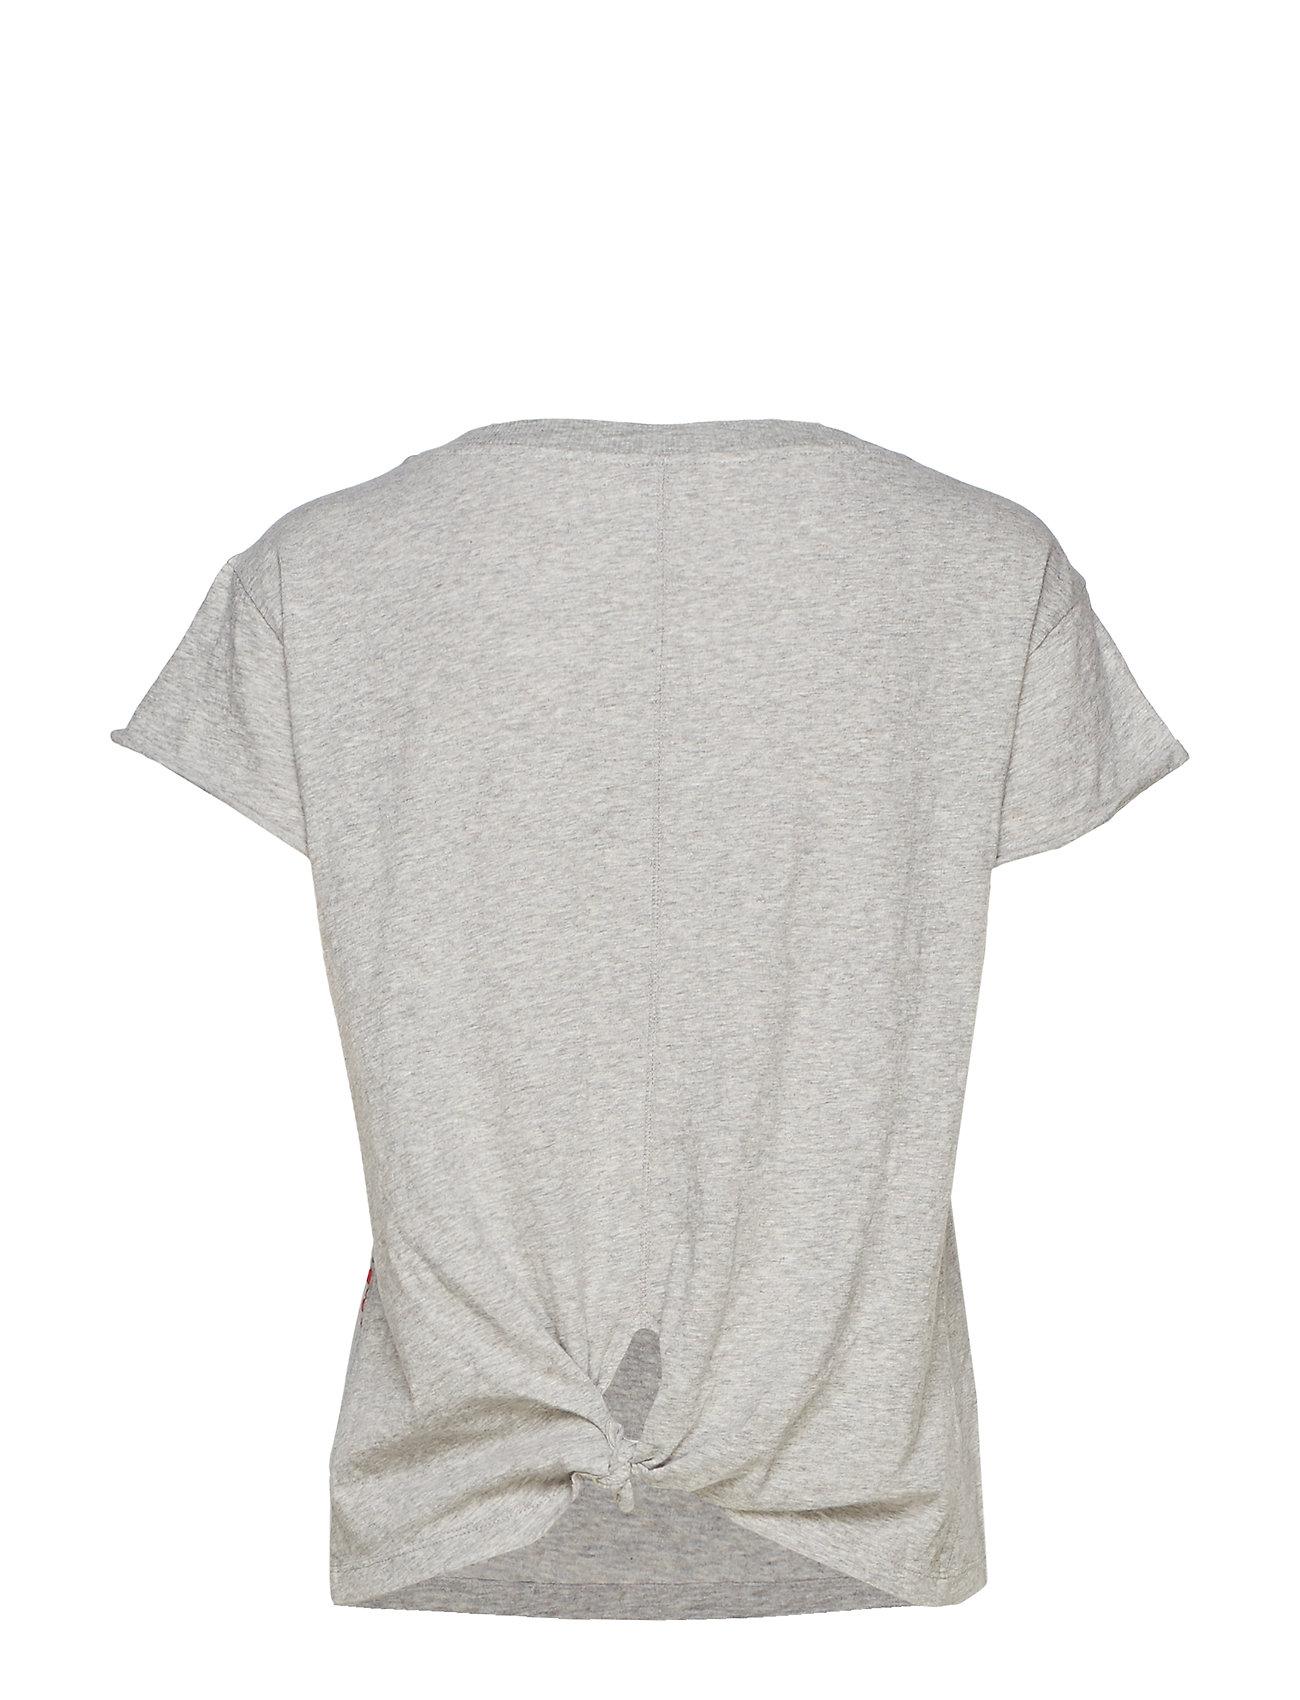 Molly Grey shirtlight T Doooer MelangeOdd f76Ygyb